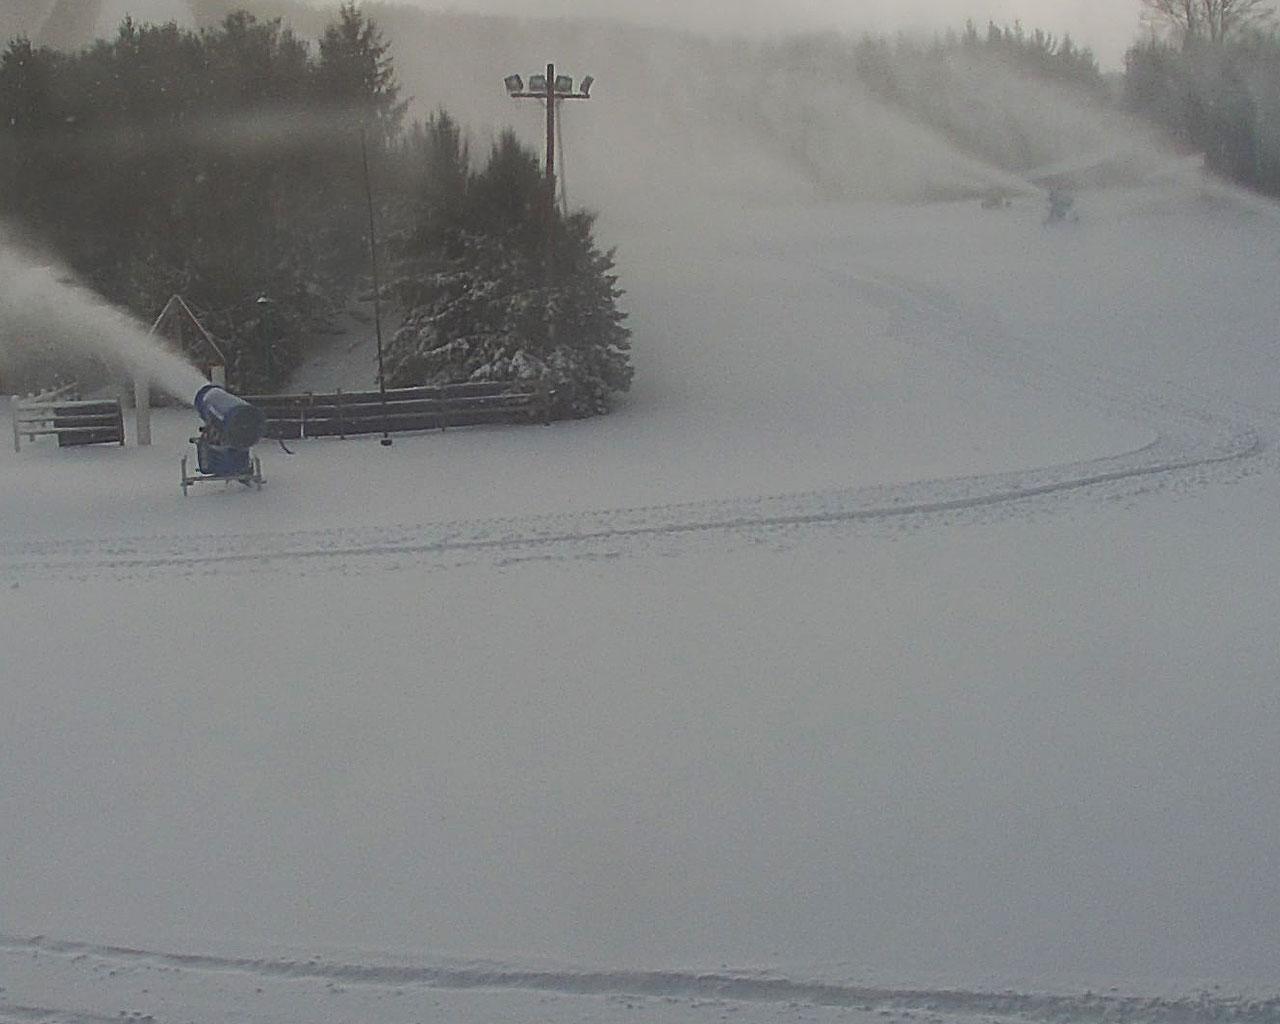 Elk Mountain Ski Resort Web Cam Image www.elkskier.com